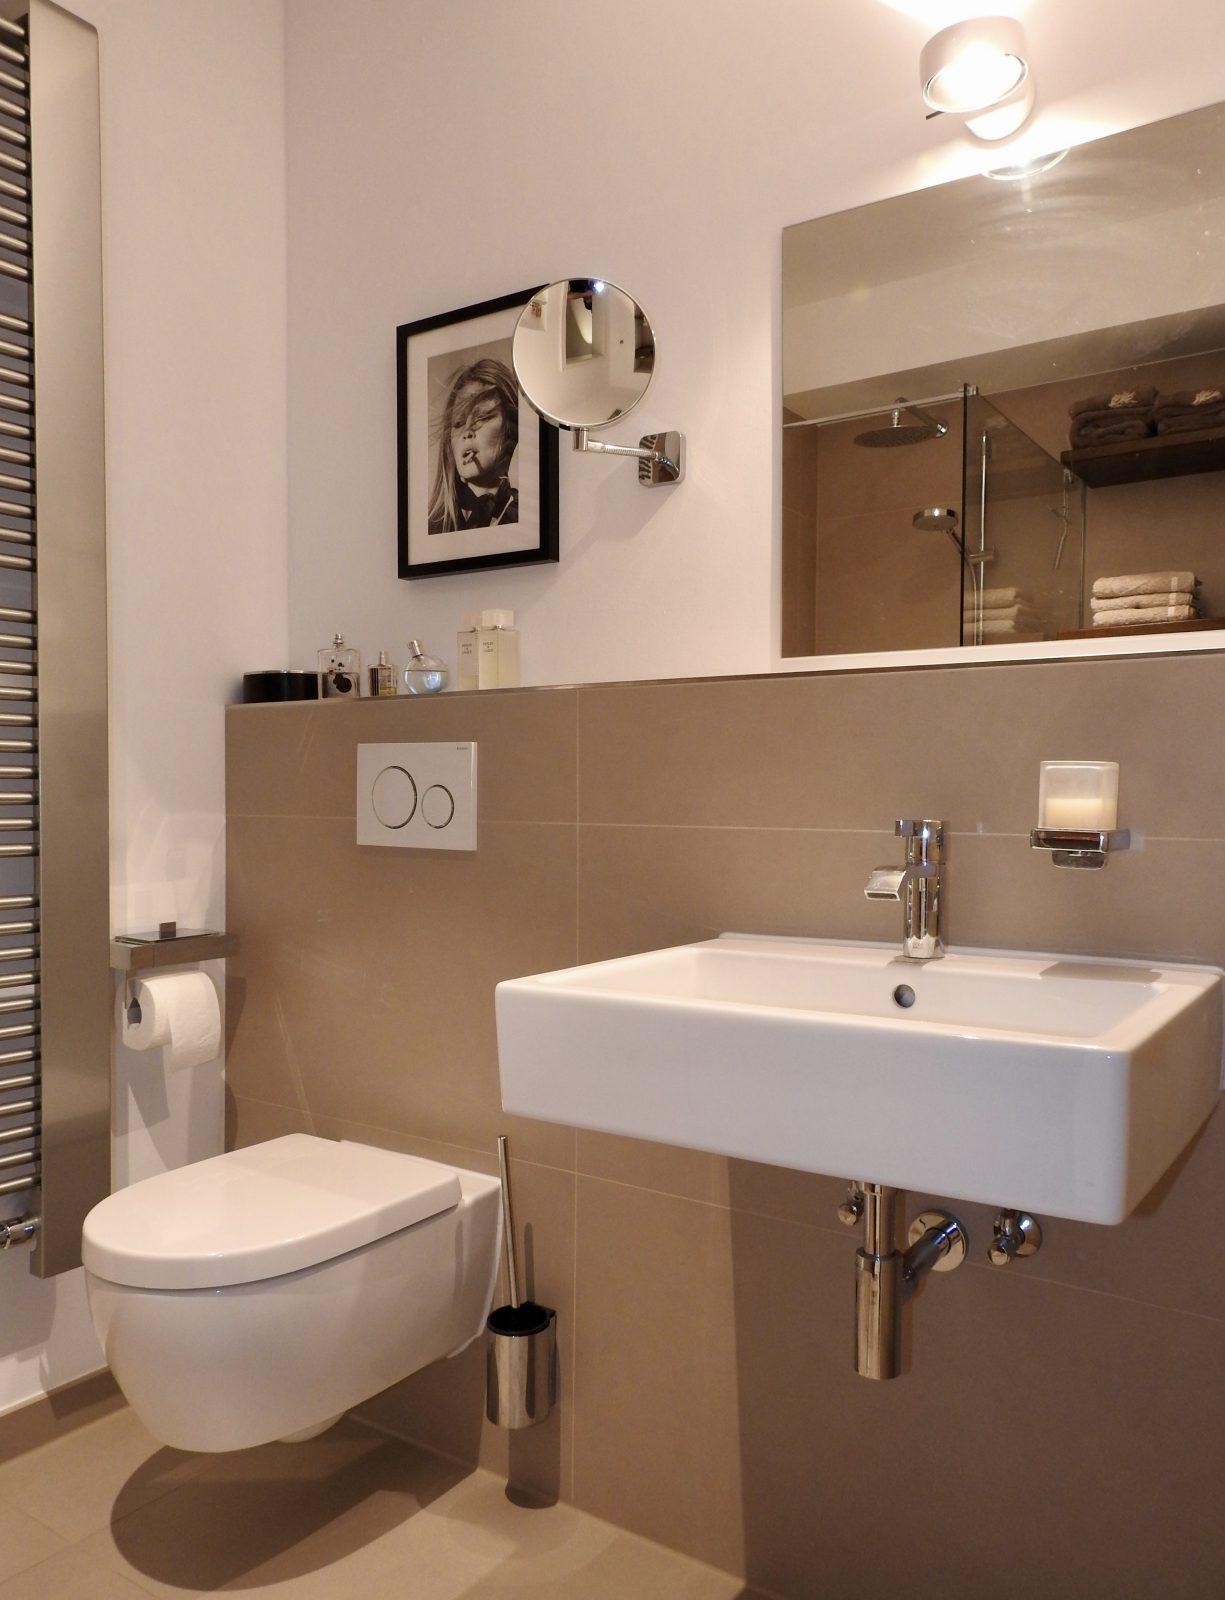 Inspirationen  NEUMANN GMBH  Mnchen  Haustechnik  Fliesen  Badgestaltung